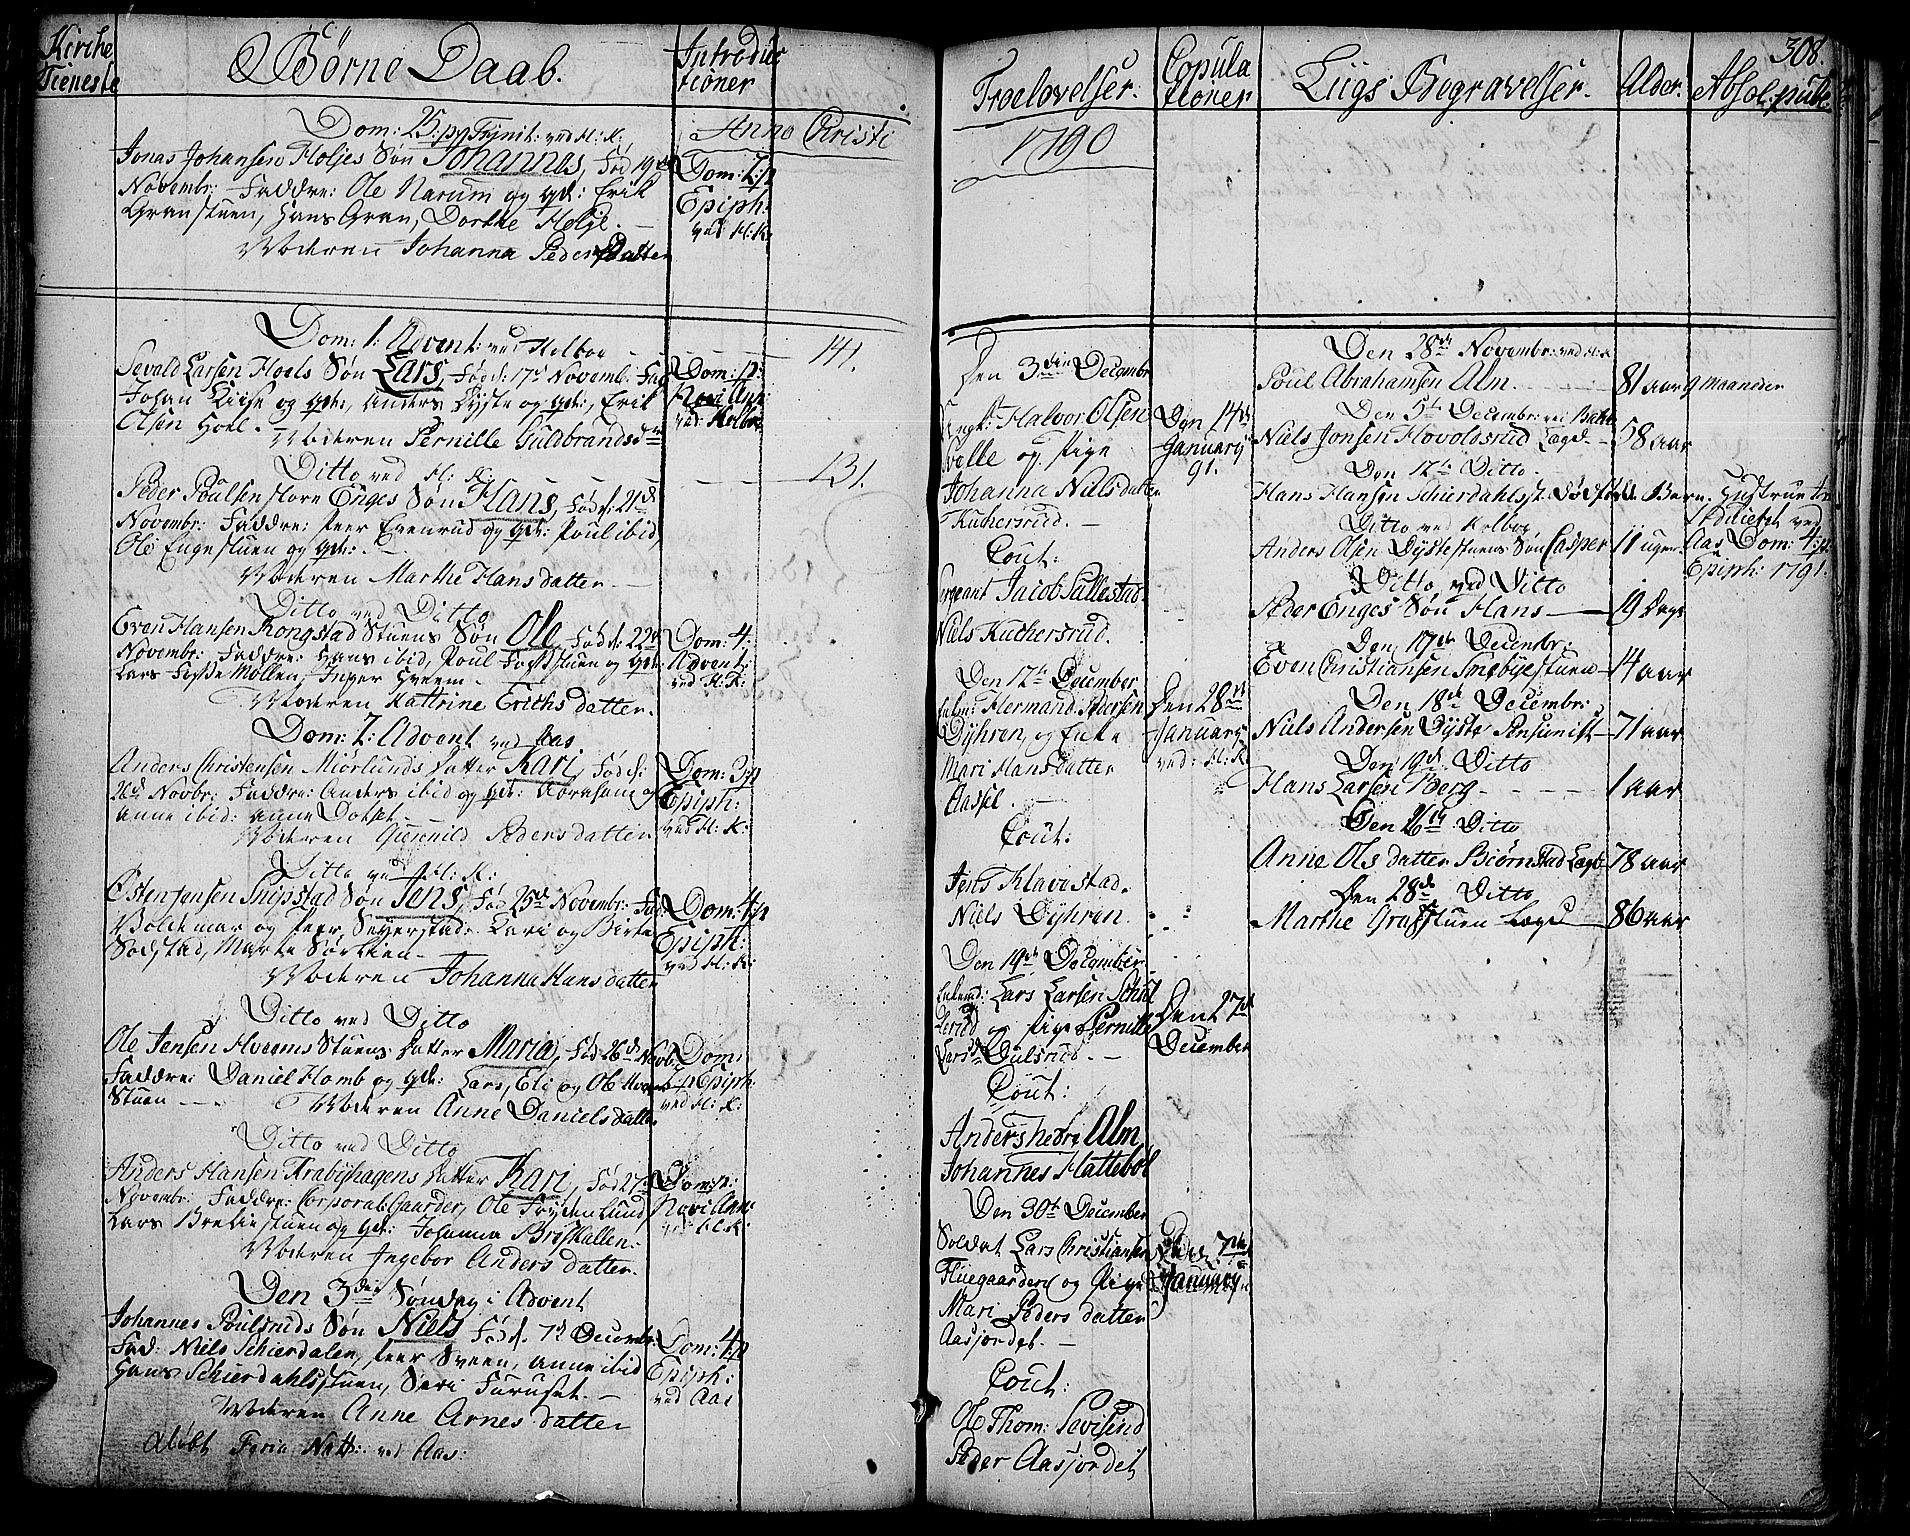 SAH, Toten prestekontor, Ministerialbok nr. 6, 1773-1793, s. 308